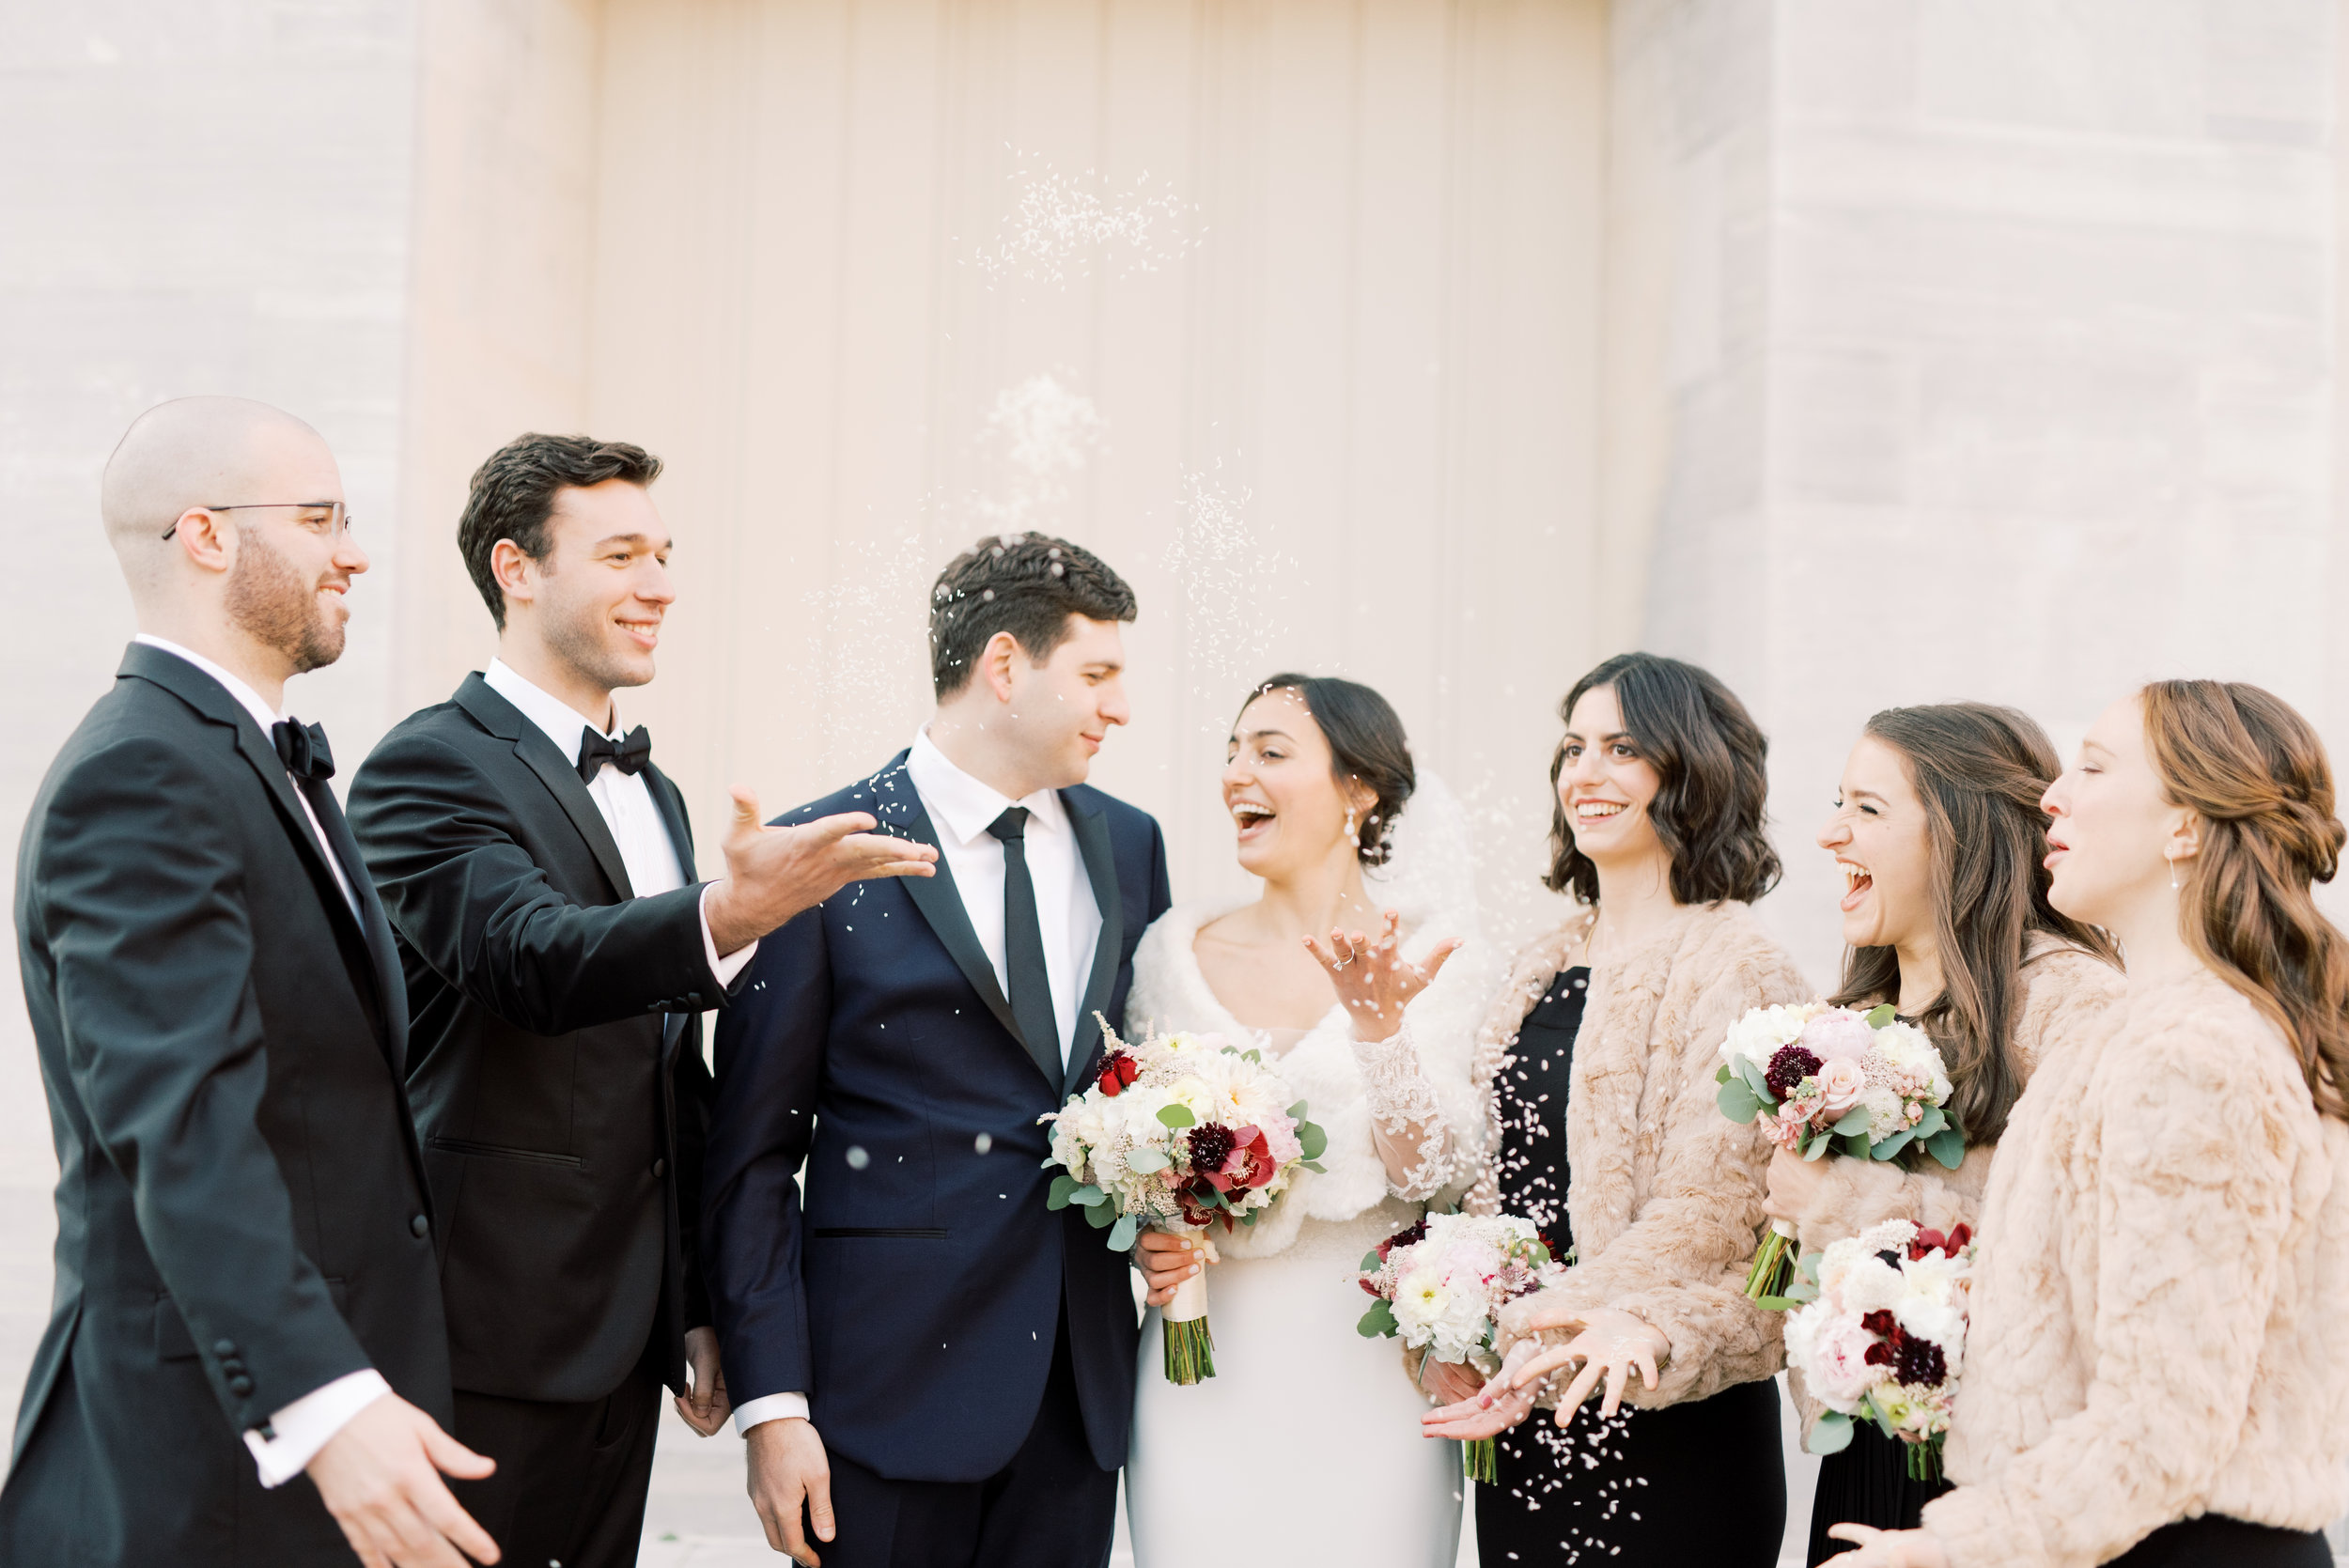 haley-richter-photography-classic-winter-union-trust-philadelphia-wedding-061.jpg